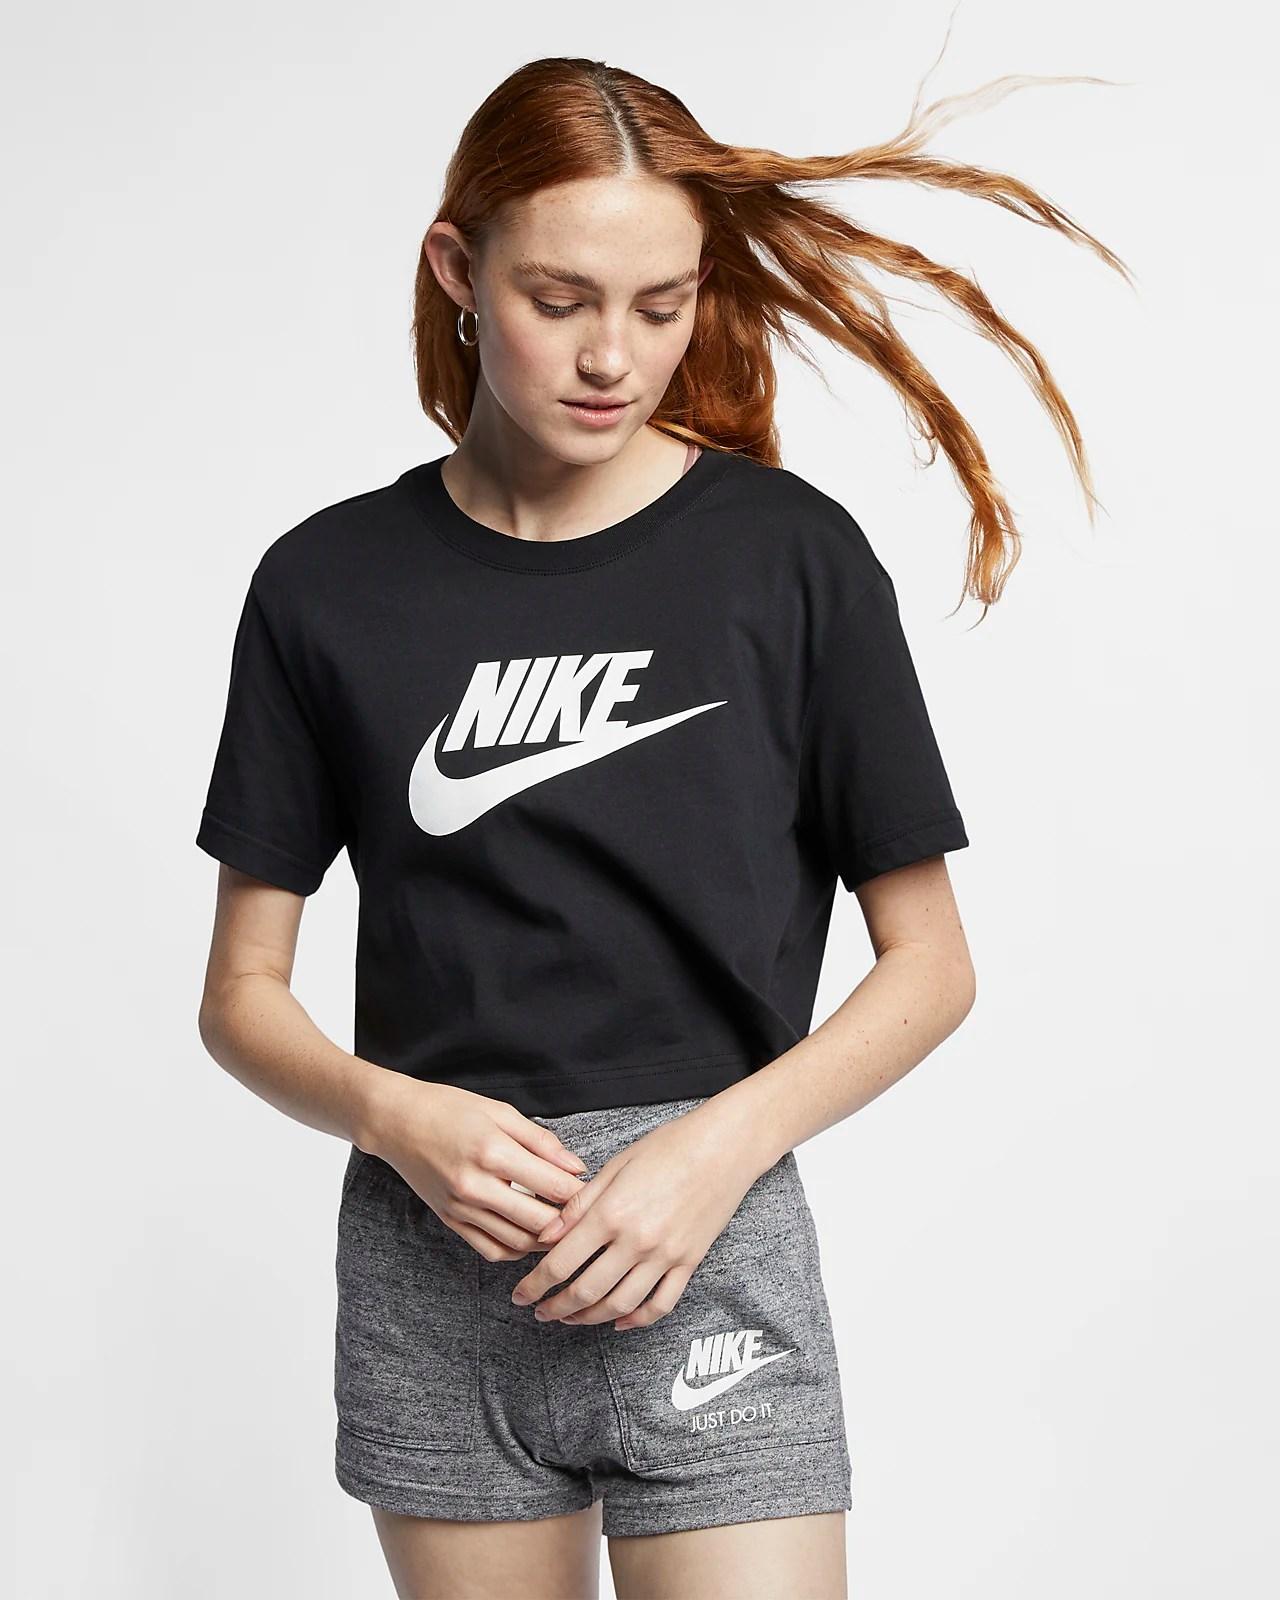 Nike Sportswear Essential 女子短款T恤-耐克(Nike)中國官網